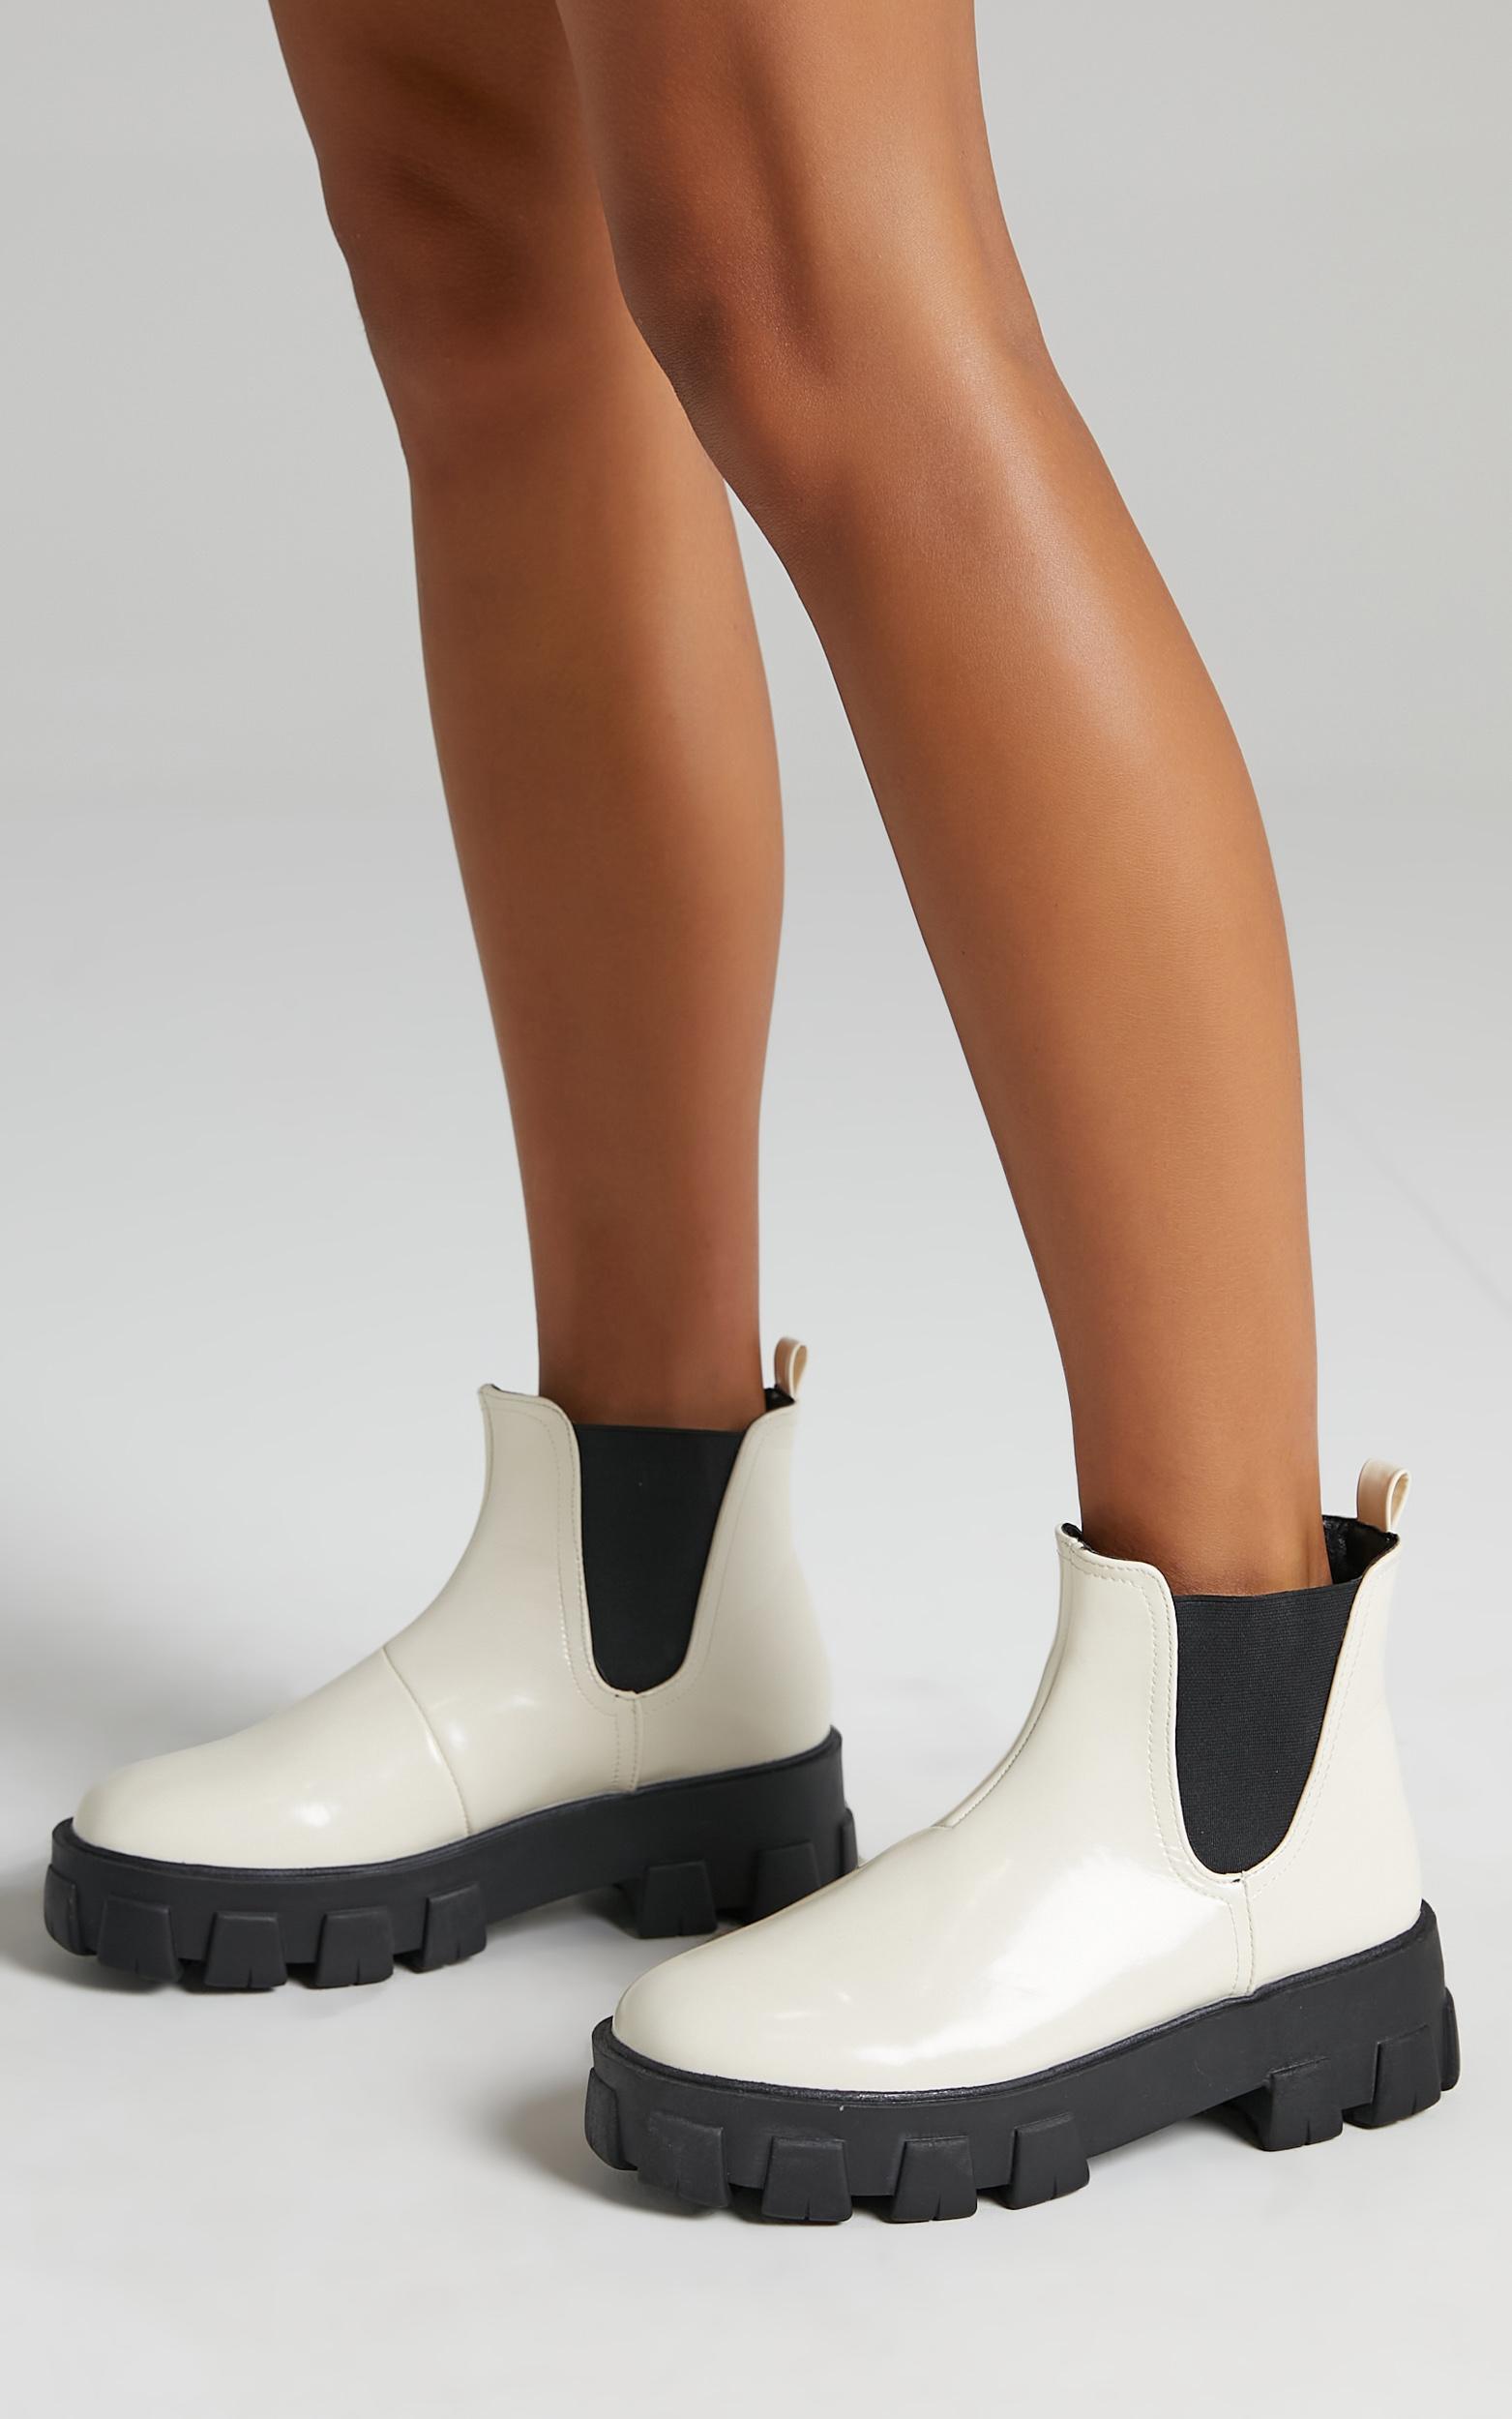 Billini - Xanthos Boots in Bone Patent - 5, Beige, hi-res image number null